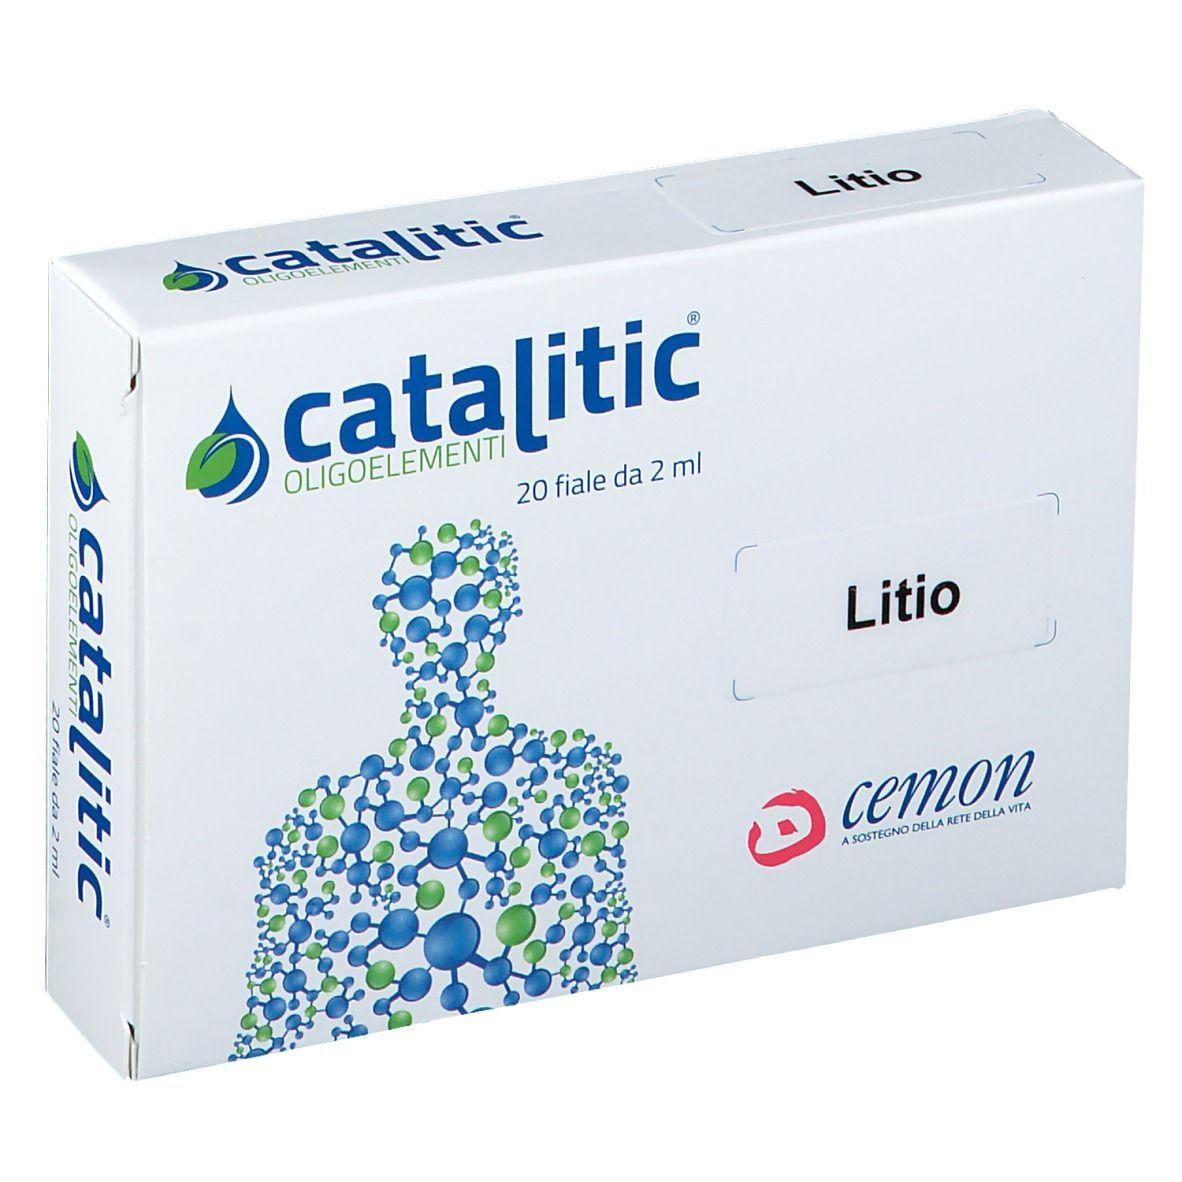 Cemon Srl Cemon Catalitic Oligoelementi Litio 20x2 ml Ampolle potabili